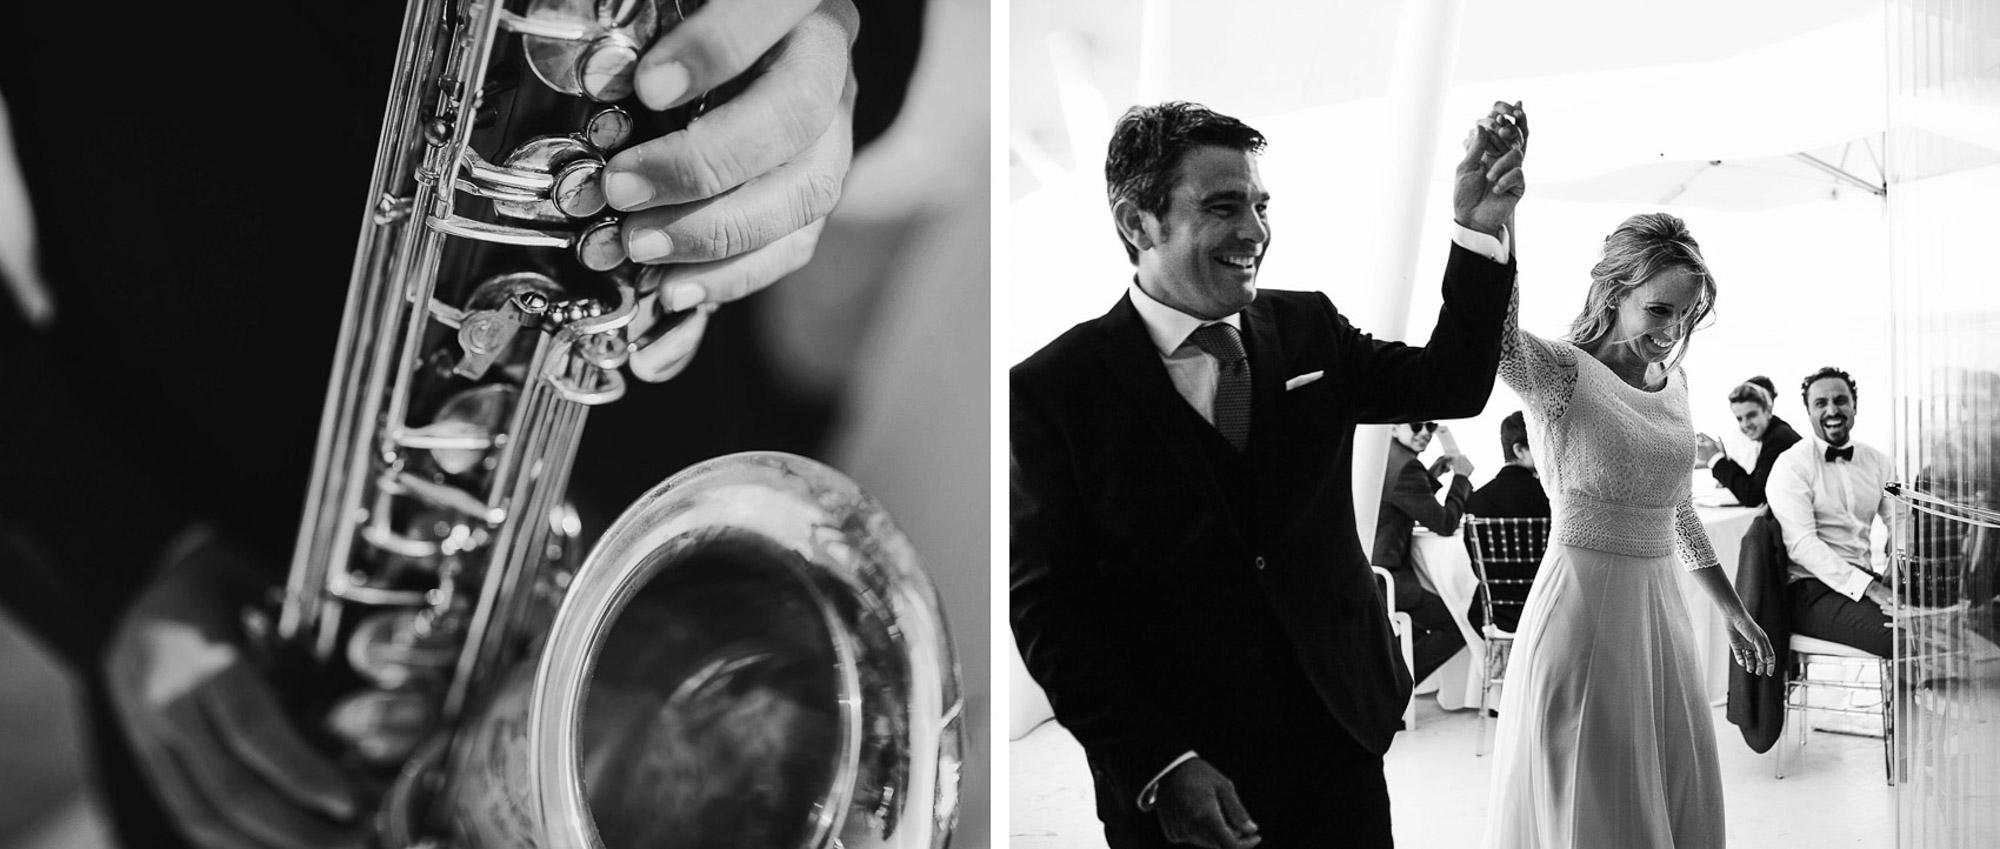 celebracion enlace novios musica saxofon fiesta Cabo de palos fotografia